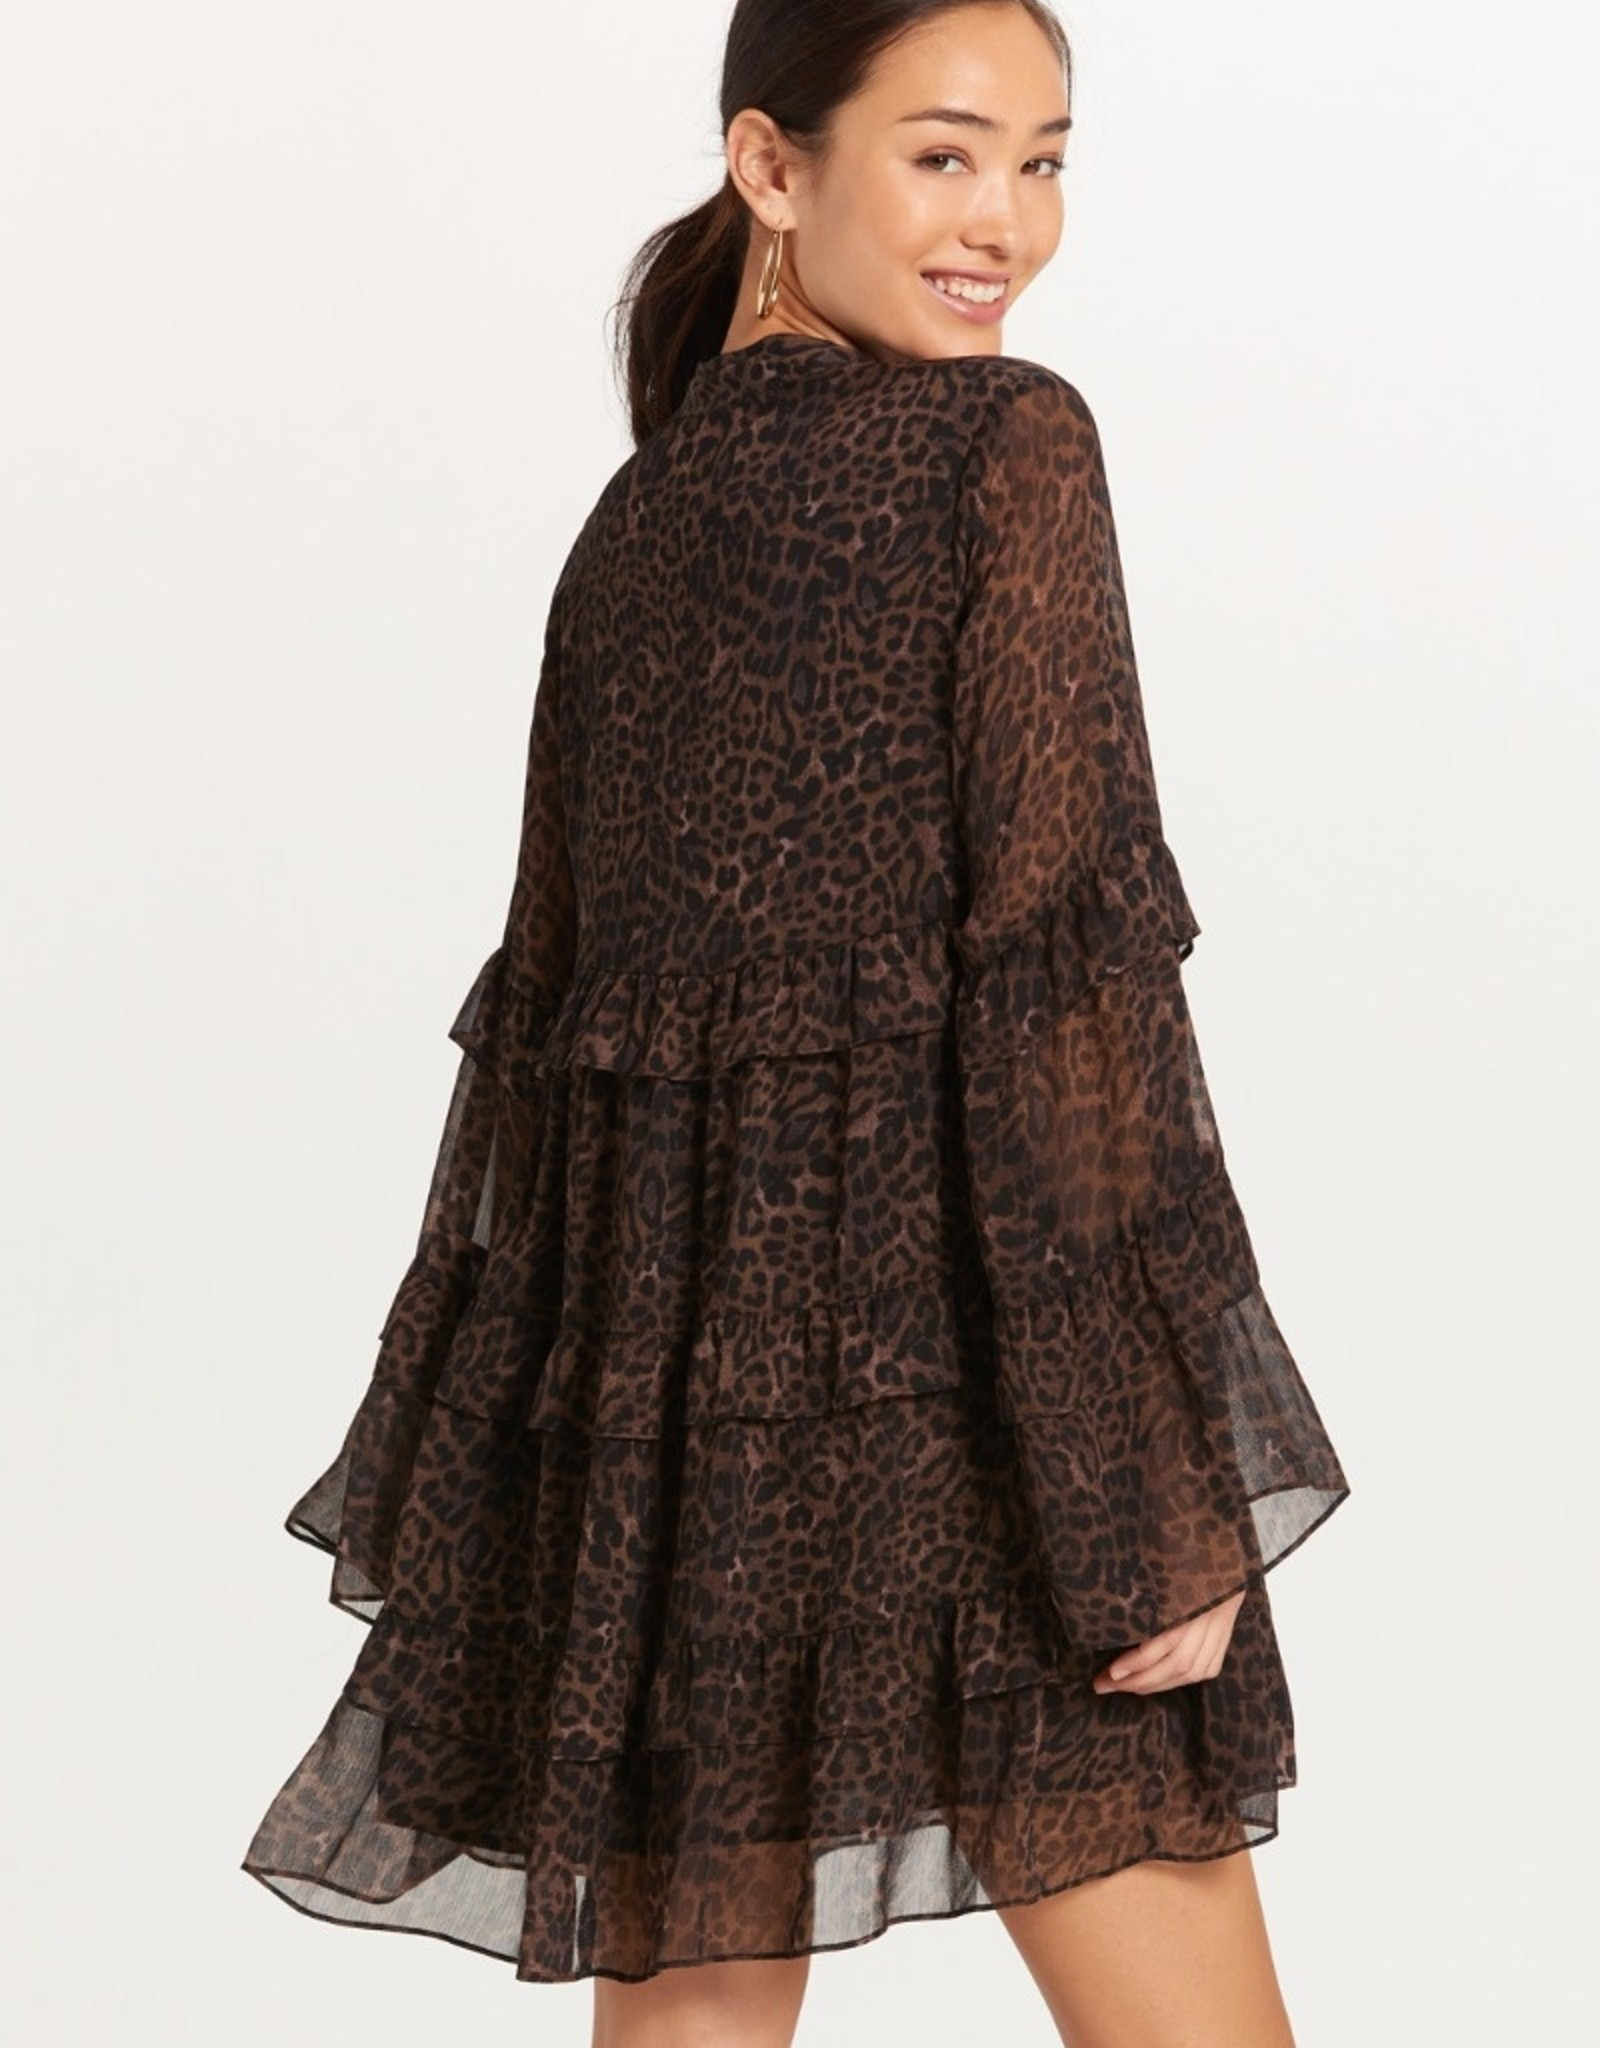 olivaceous Dark Leopard Flute Sleeve Tiered Dress BROWN/BLACK